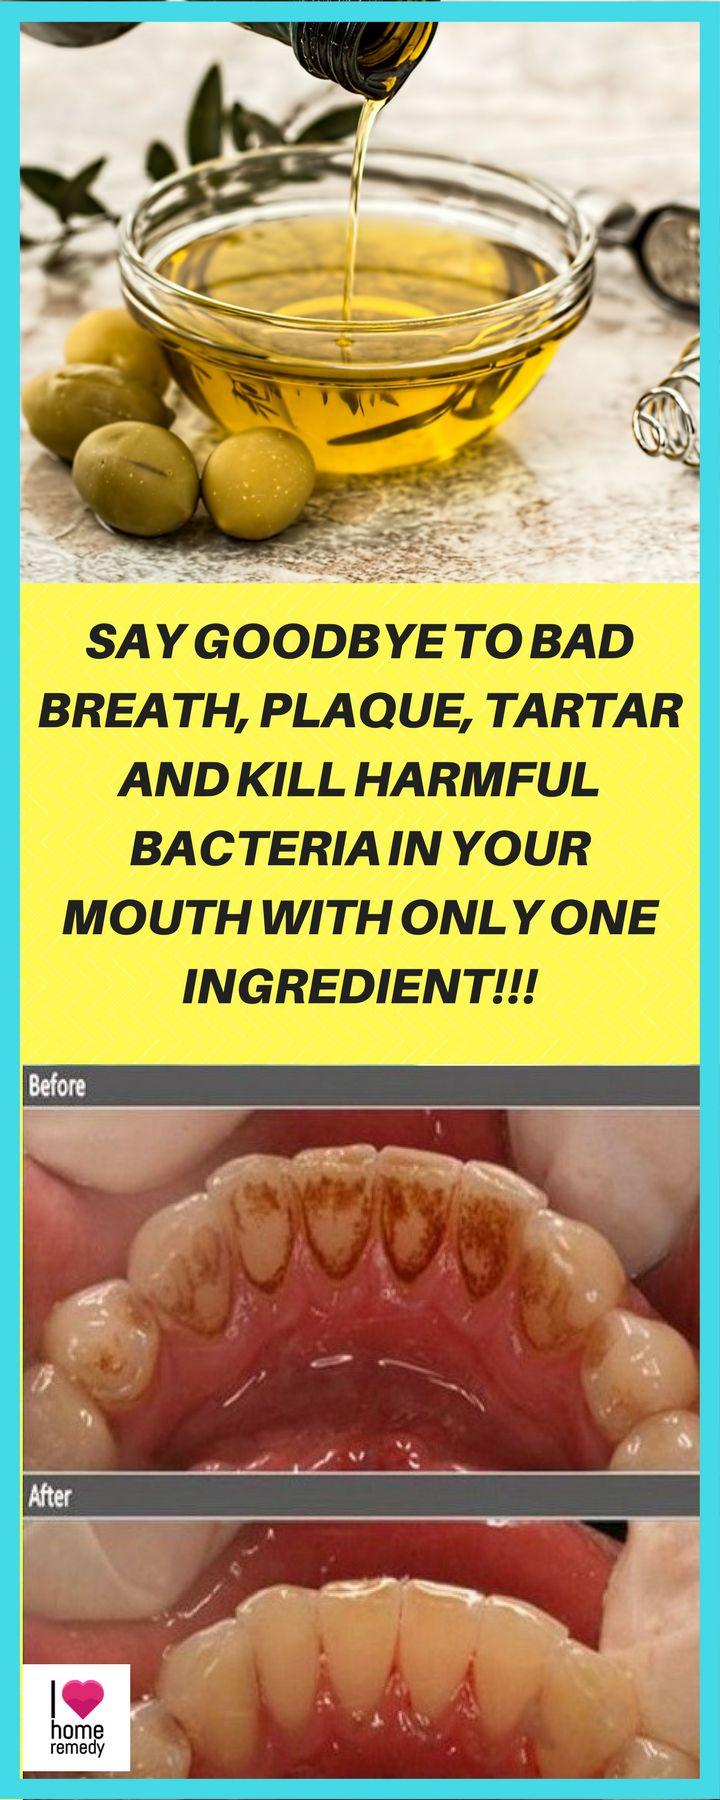 how to get tartar off teeth naturally